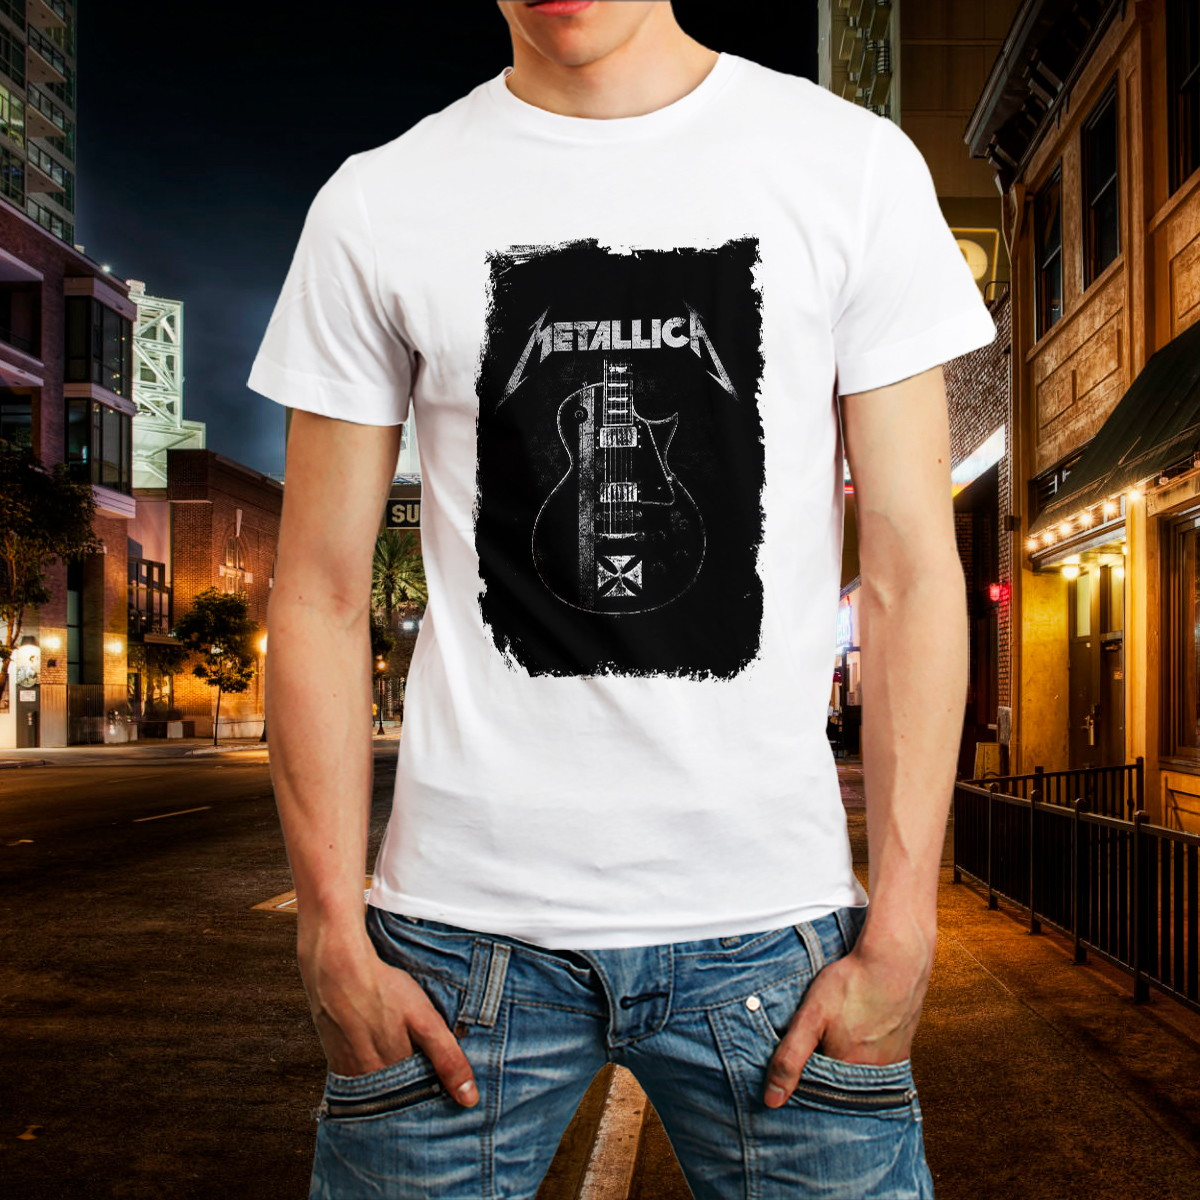 bc1afd82bcc Camiseta de Banda Rock Metallica Camisa Roupa Branca BARATO no Elo7 ...